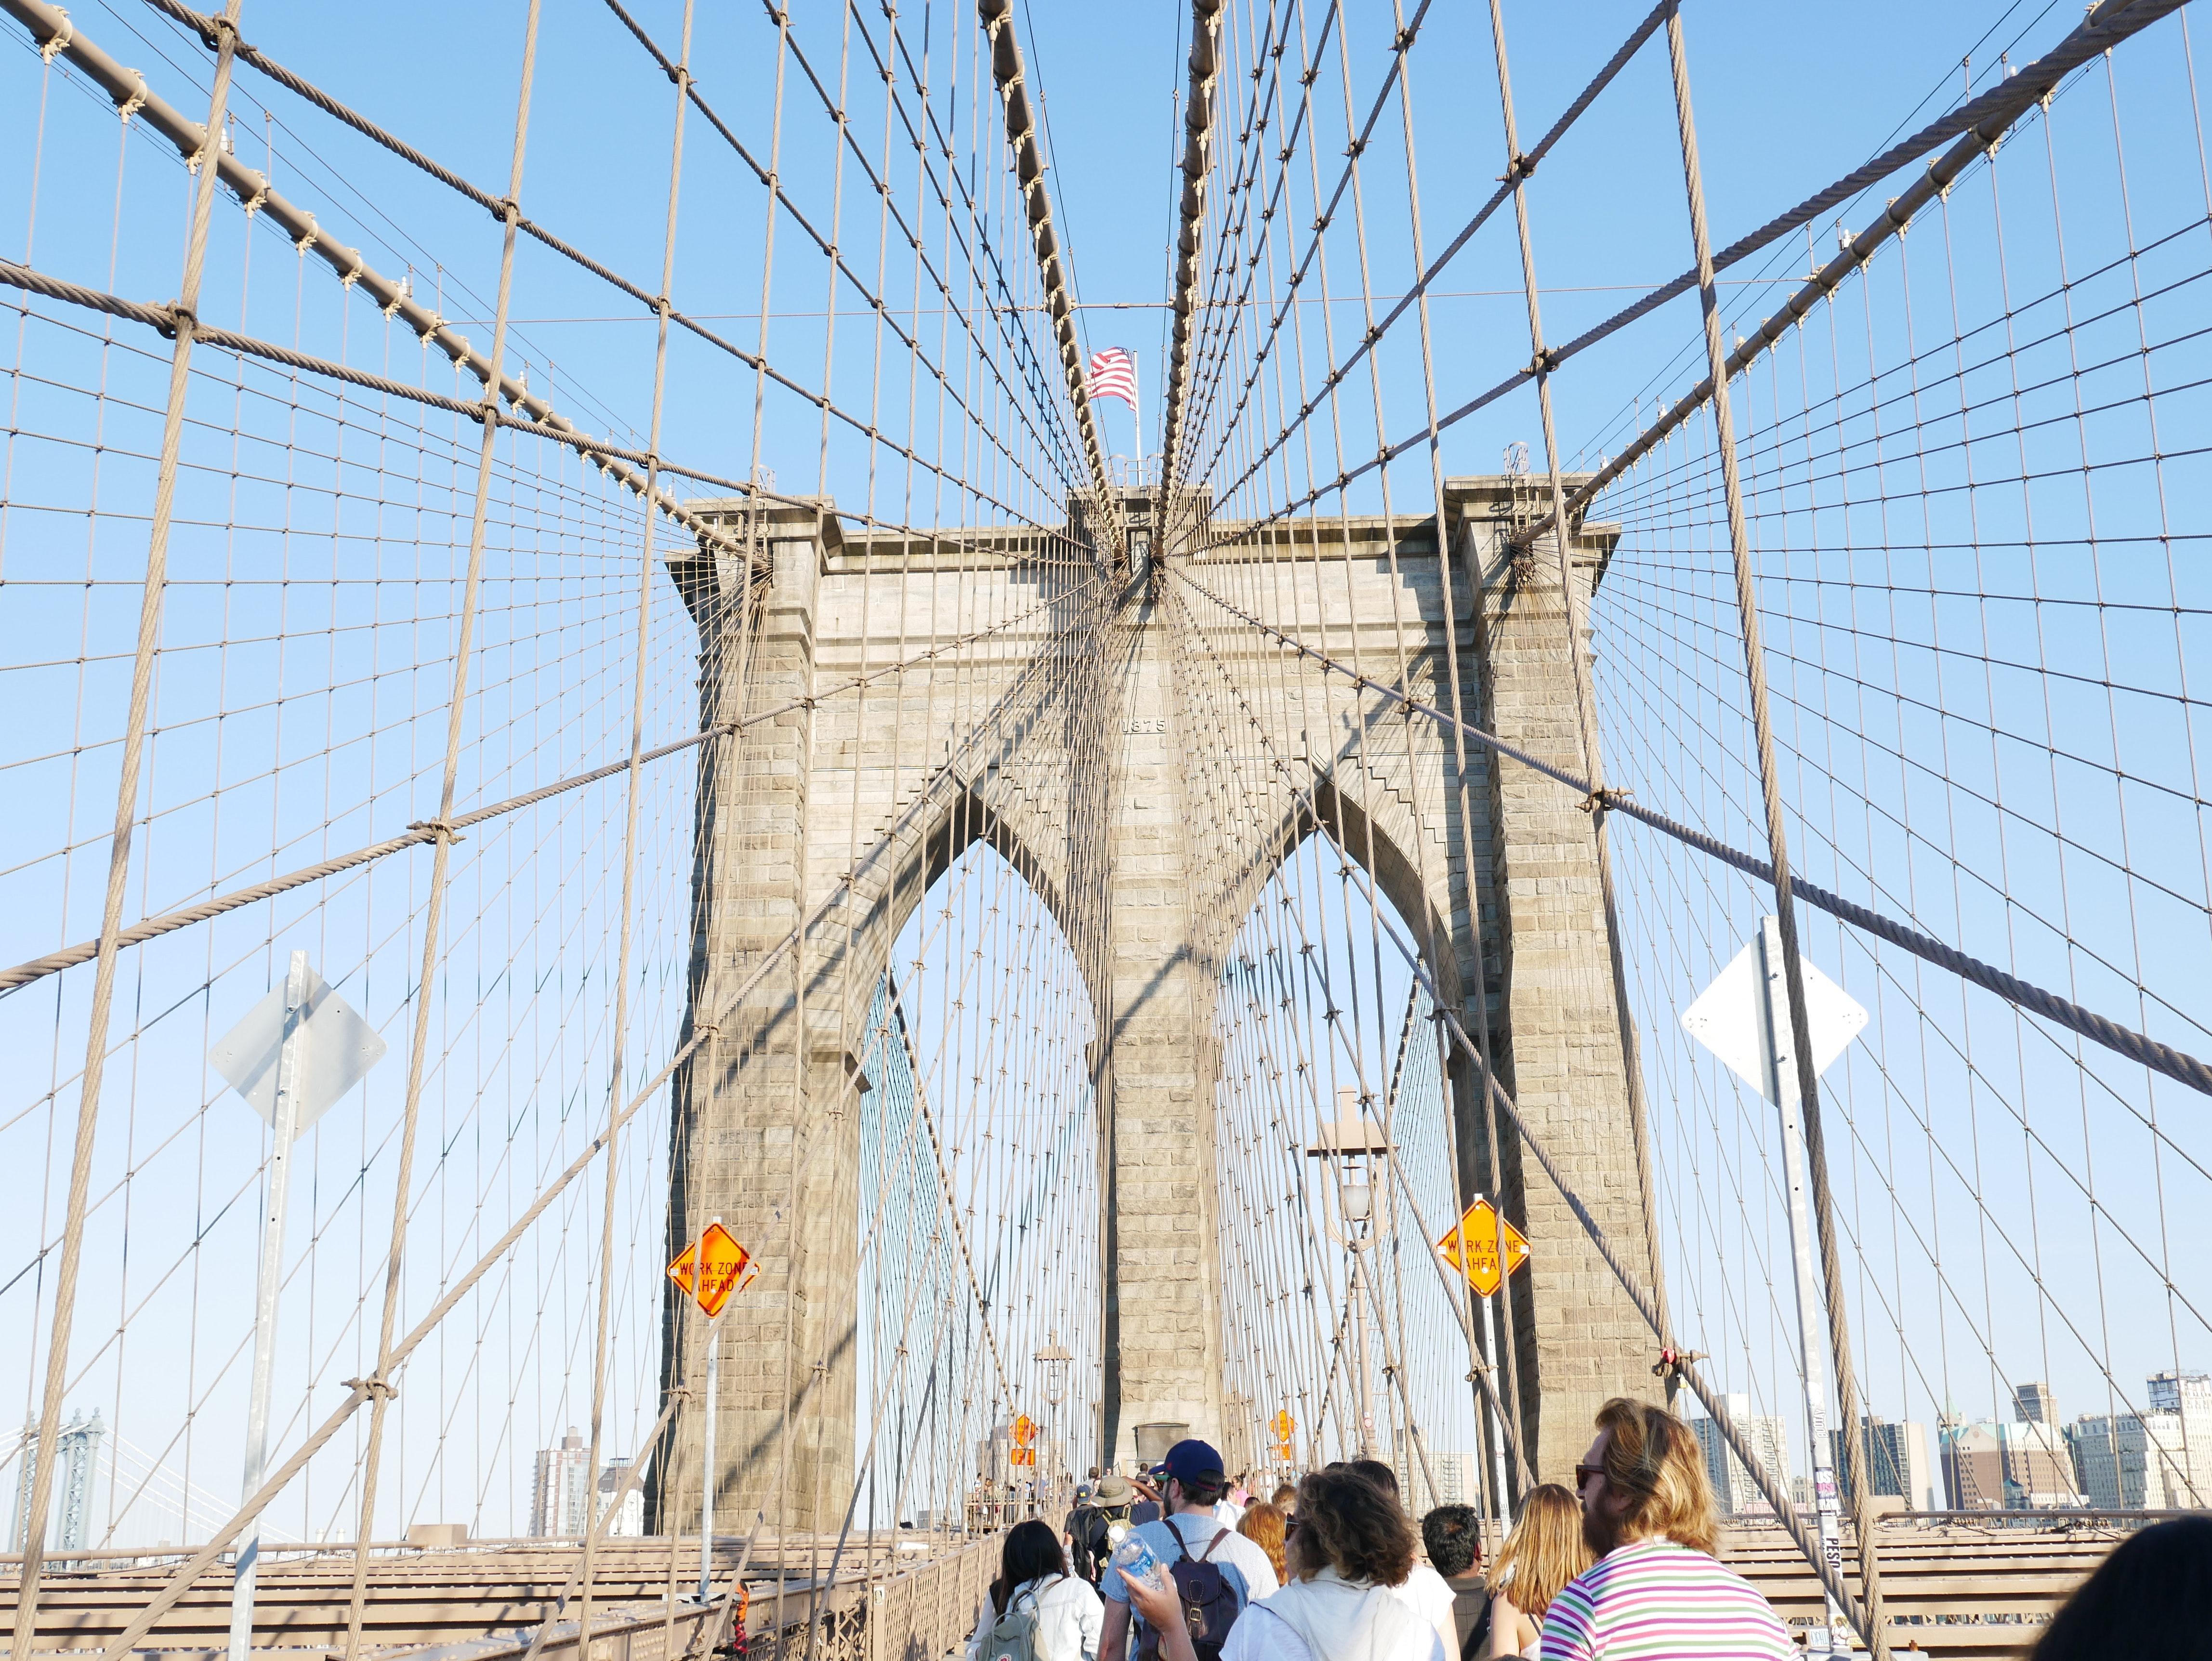 Brooklyn bridge, u.s.a. photo